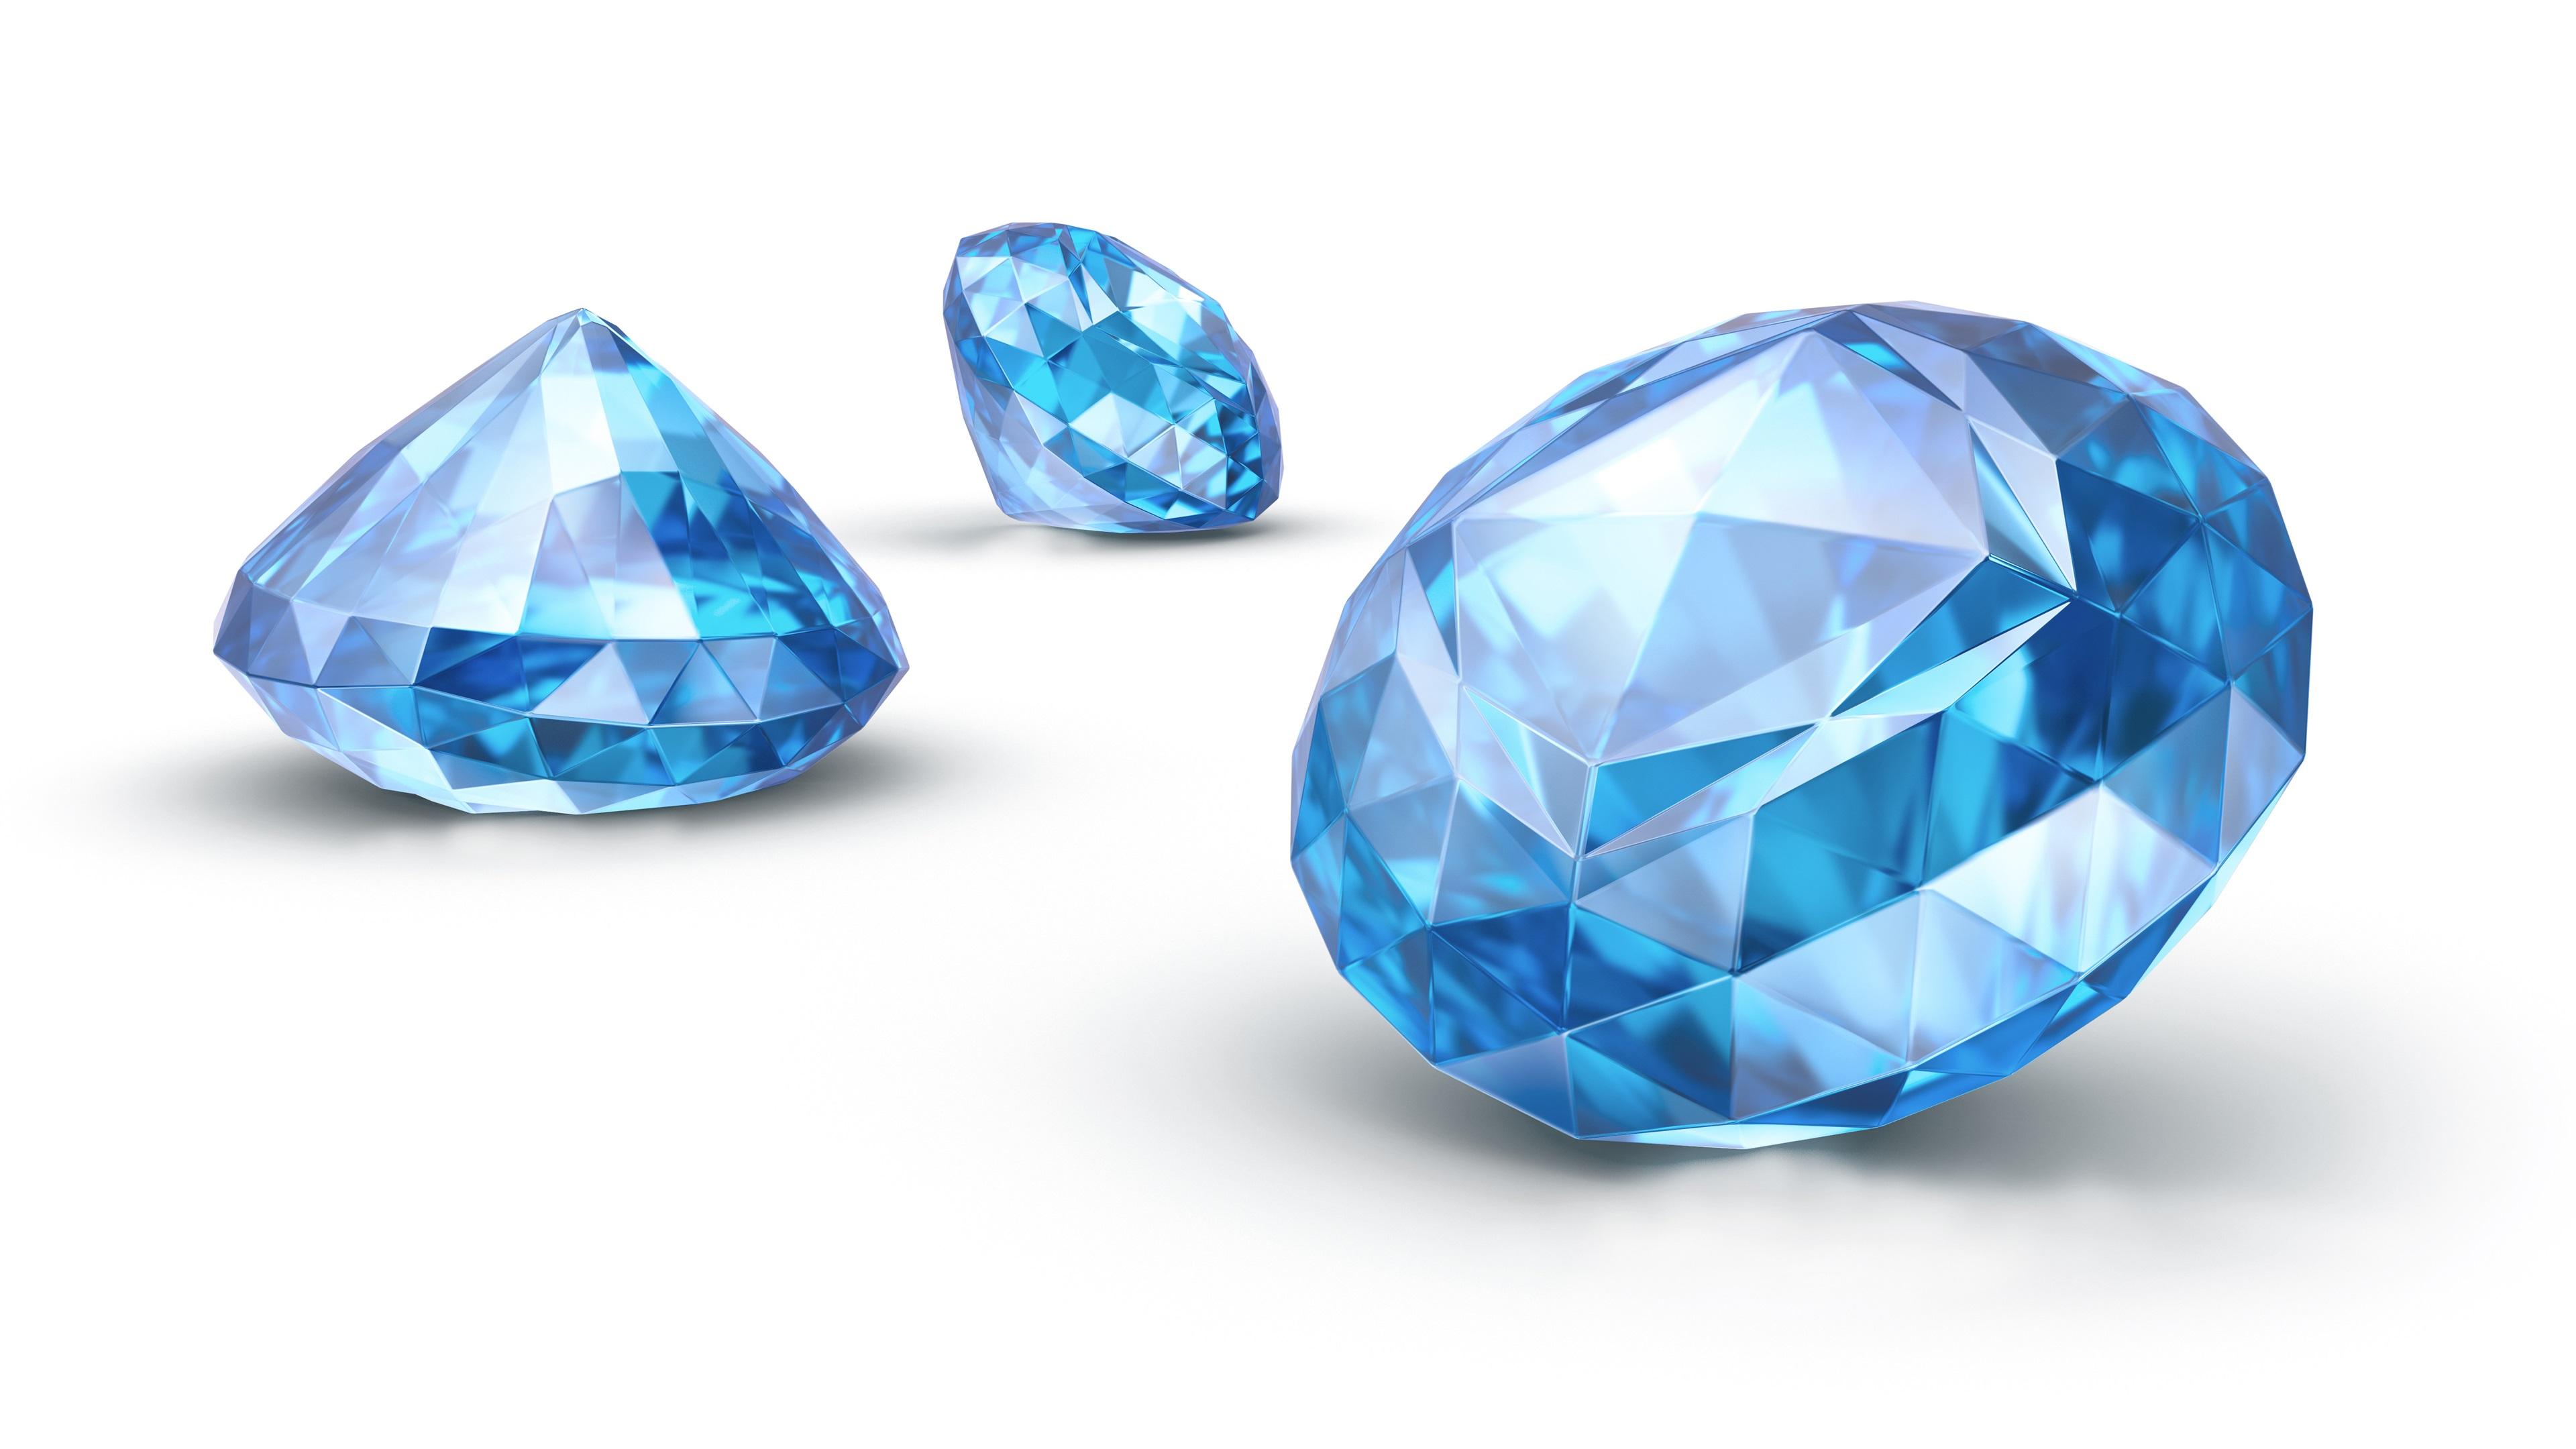 Wallpaper Sapphire Blue Diamond 3840x2160 UHD 4K Picture Image